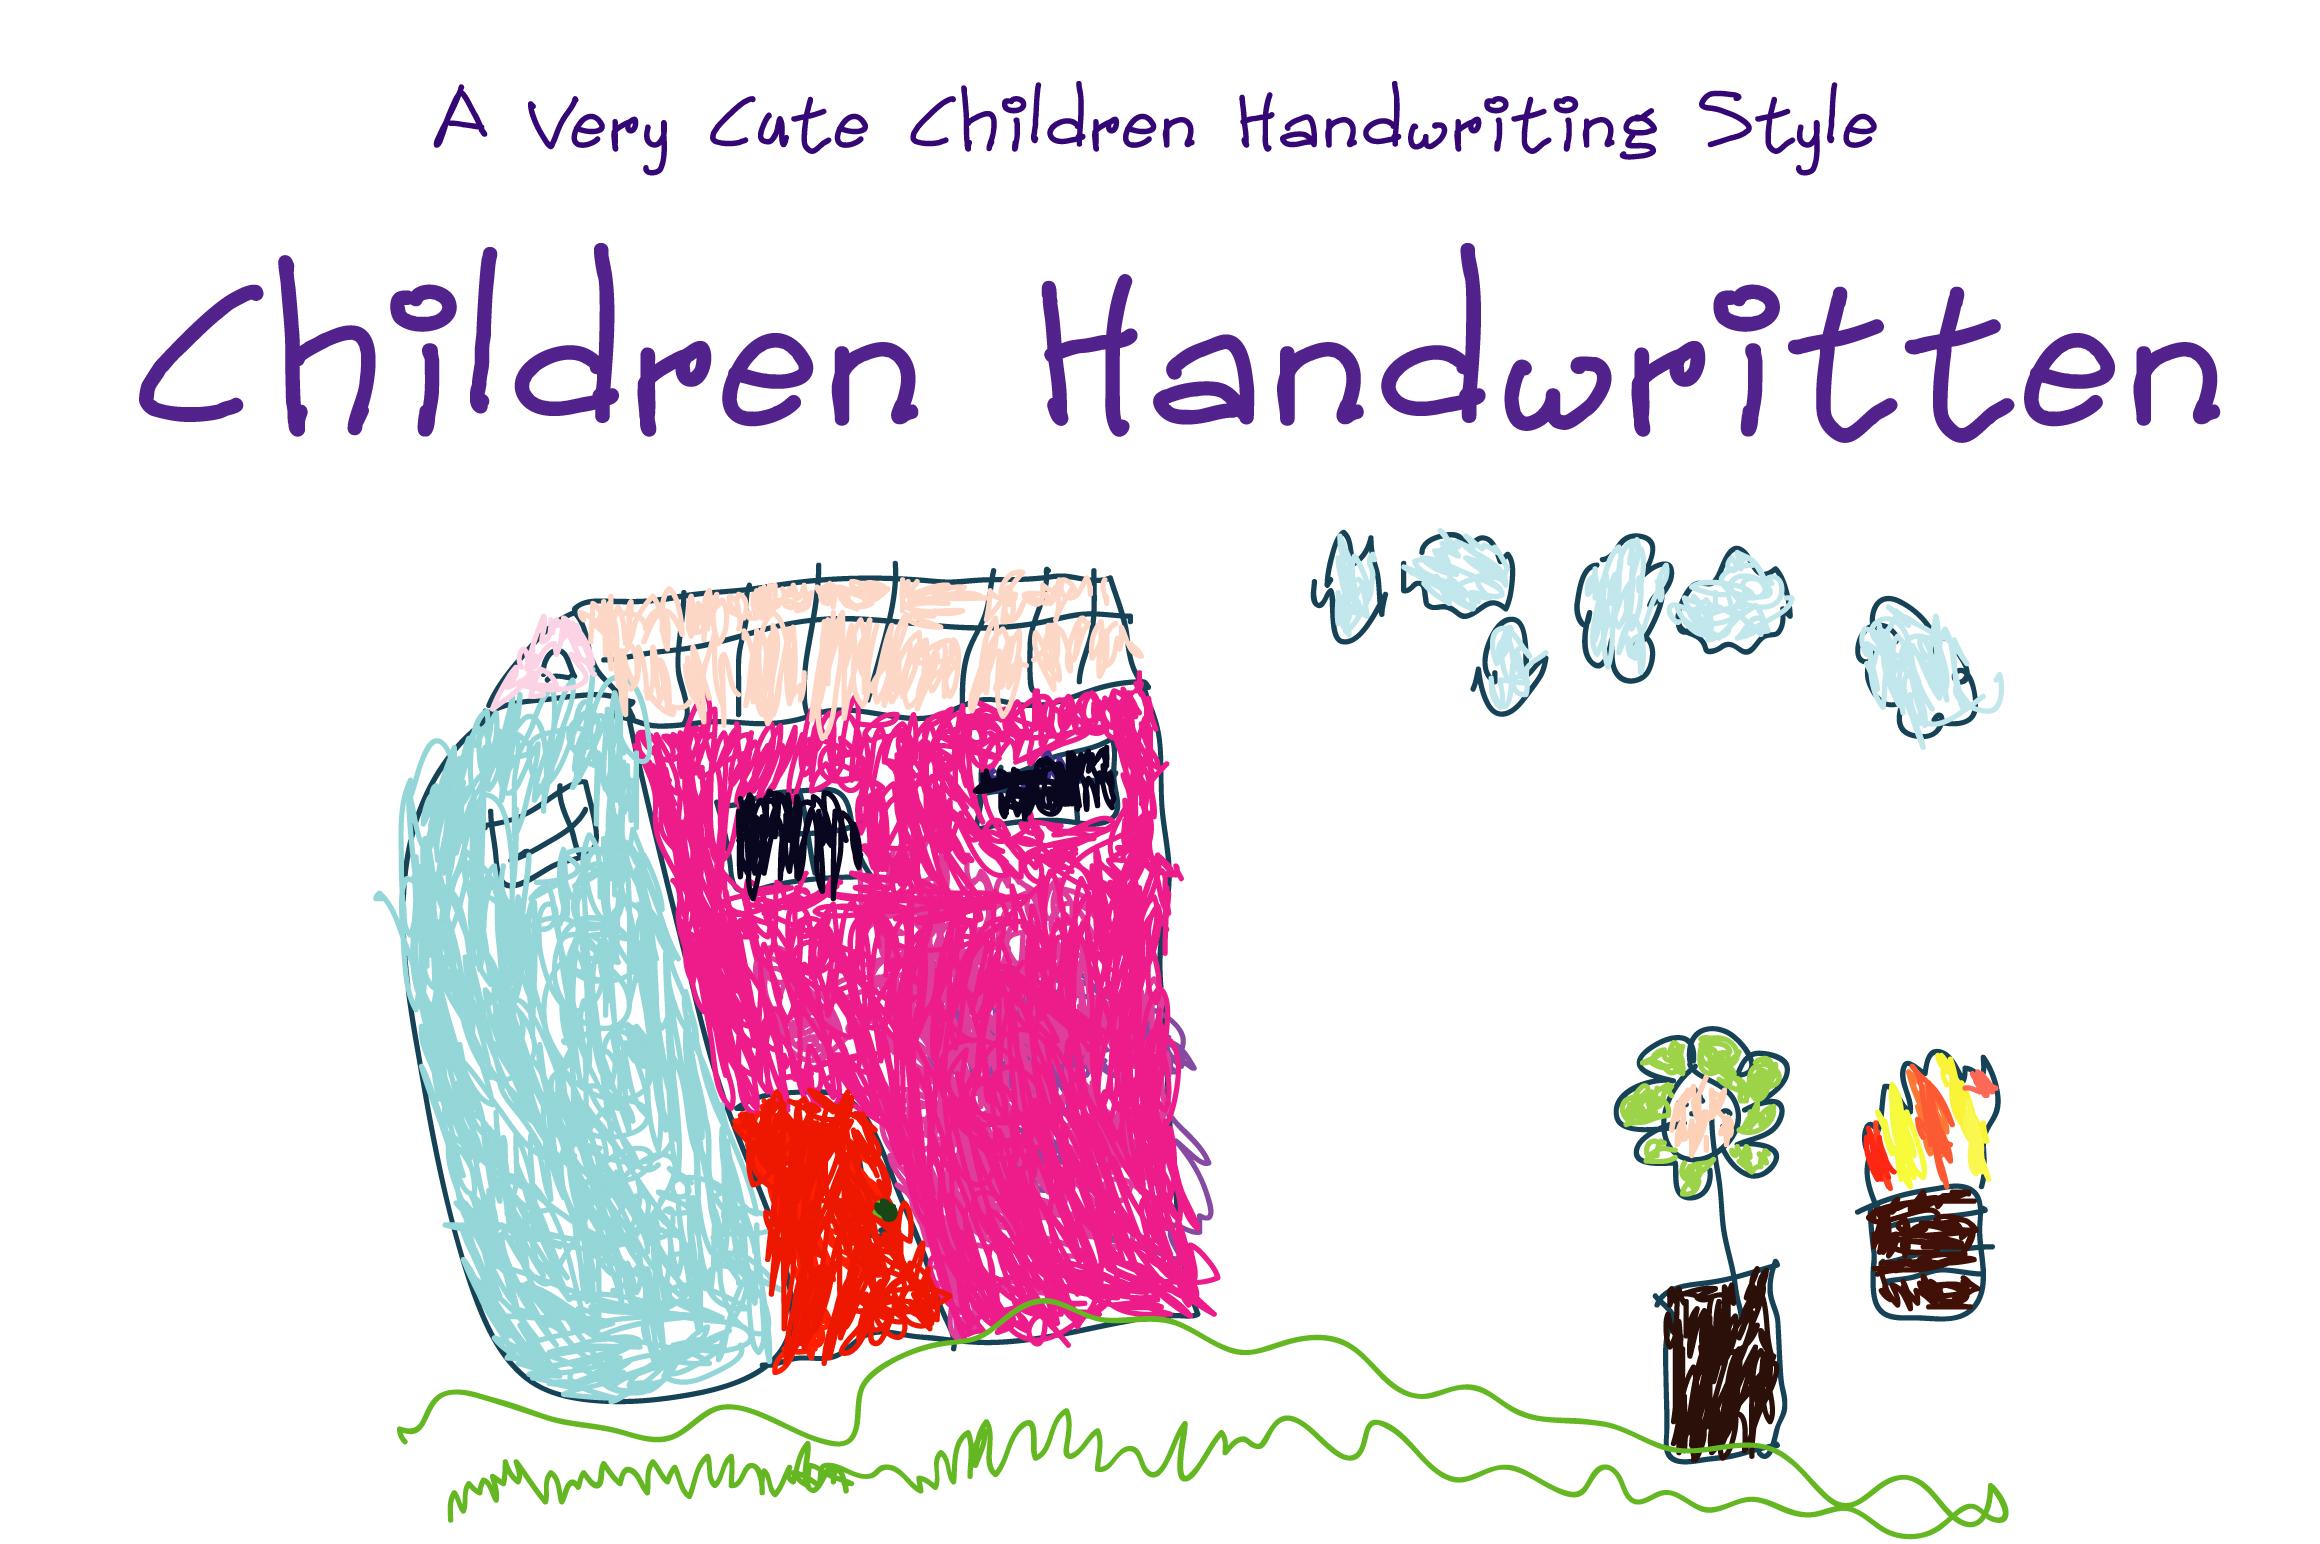 Children Handwritten example image 1